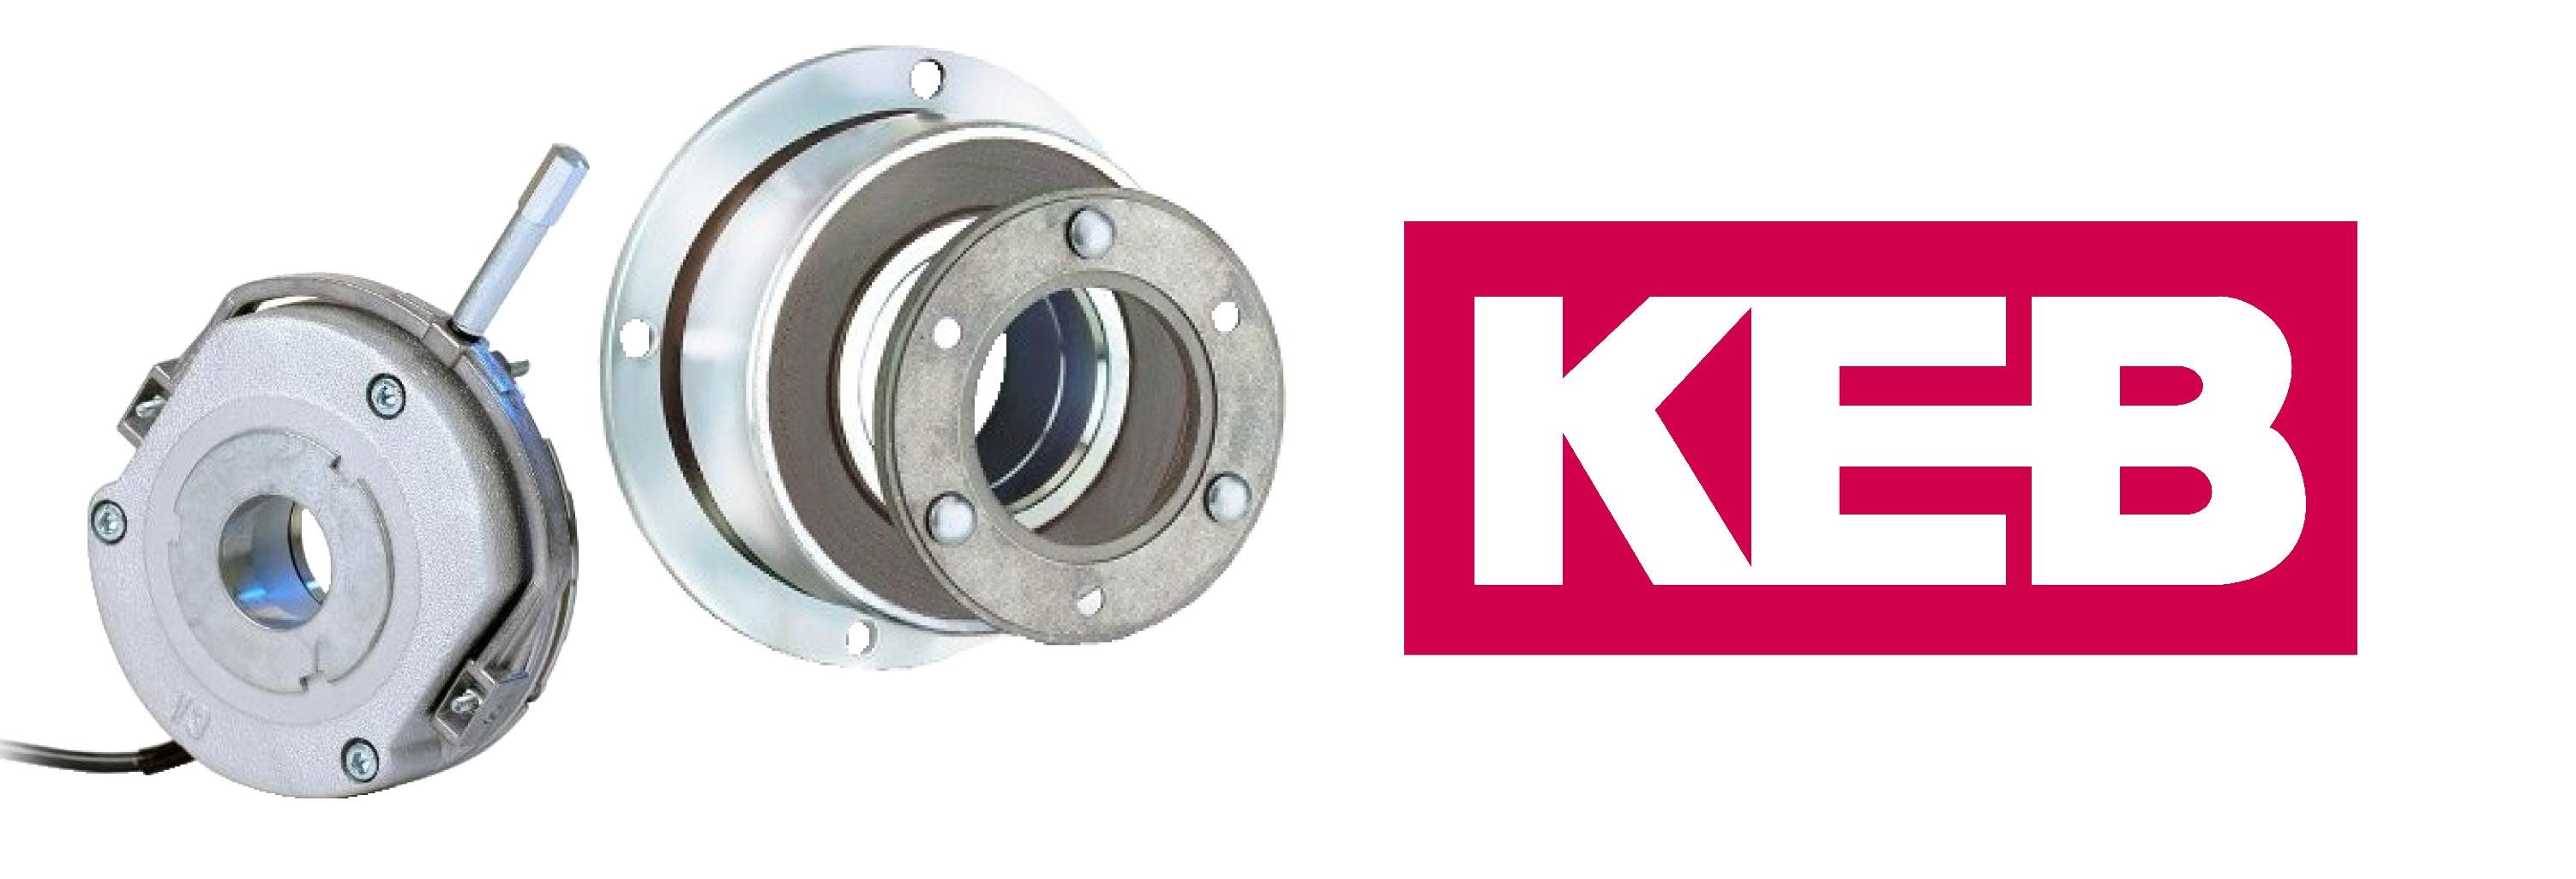 KEB Magnet Technology